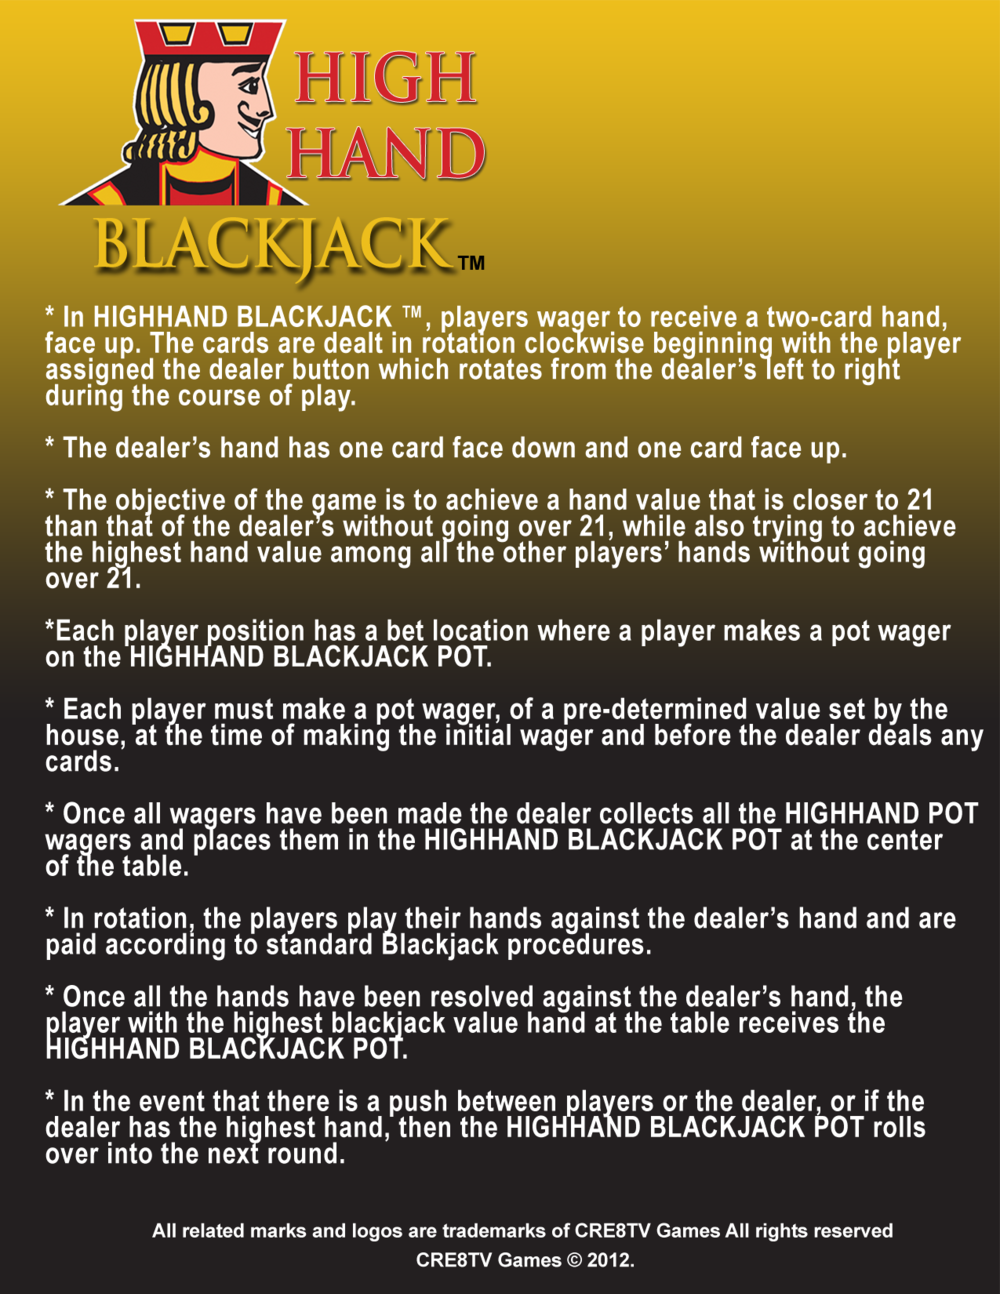 HighHand Blackjack Game Sheet